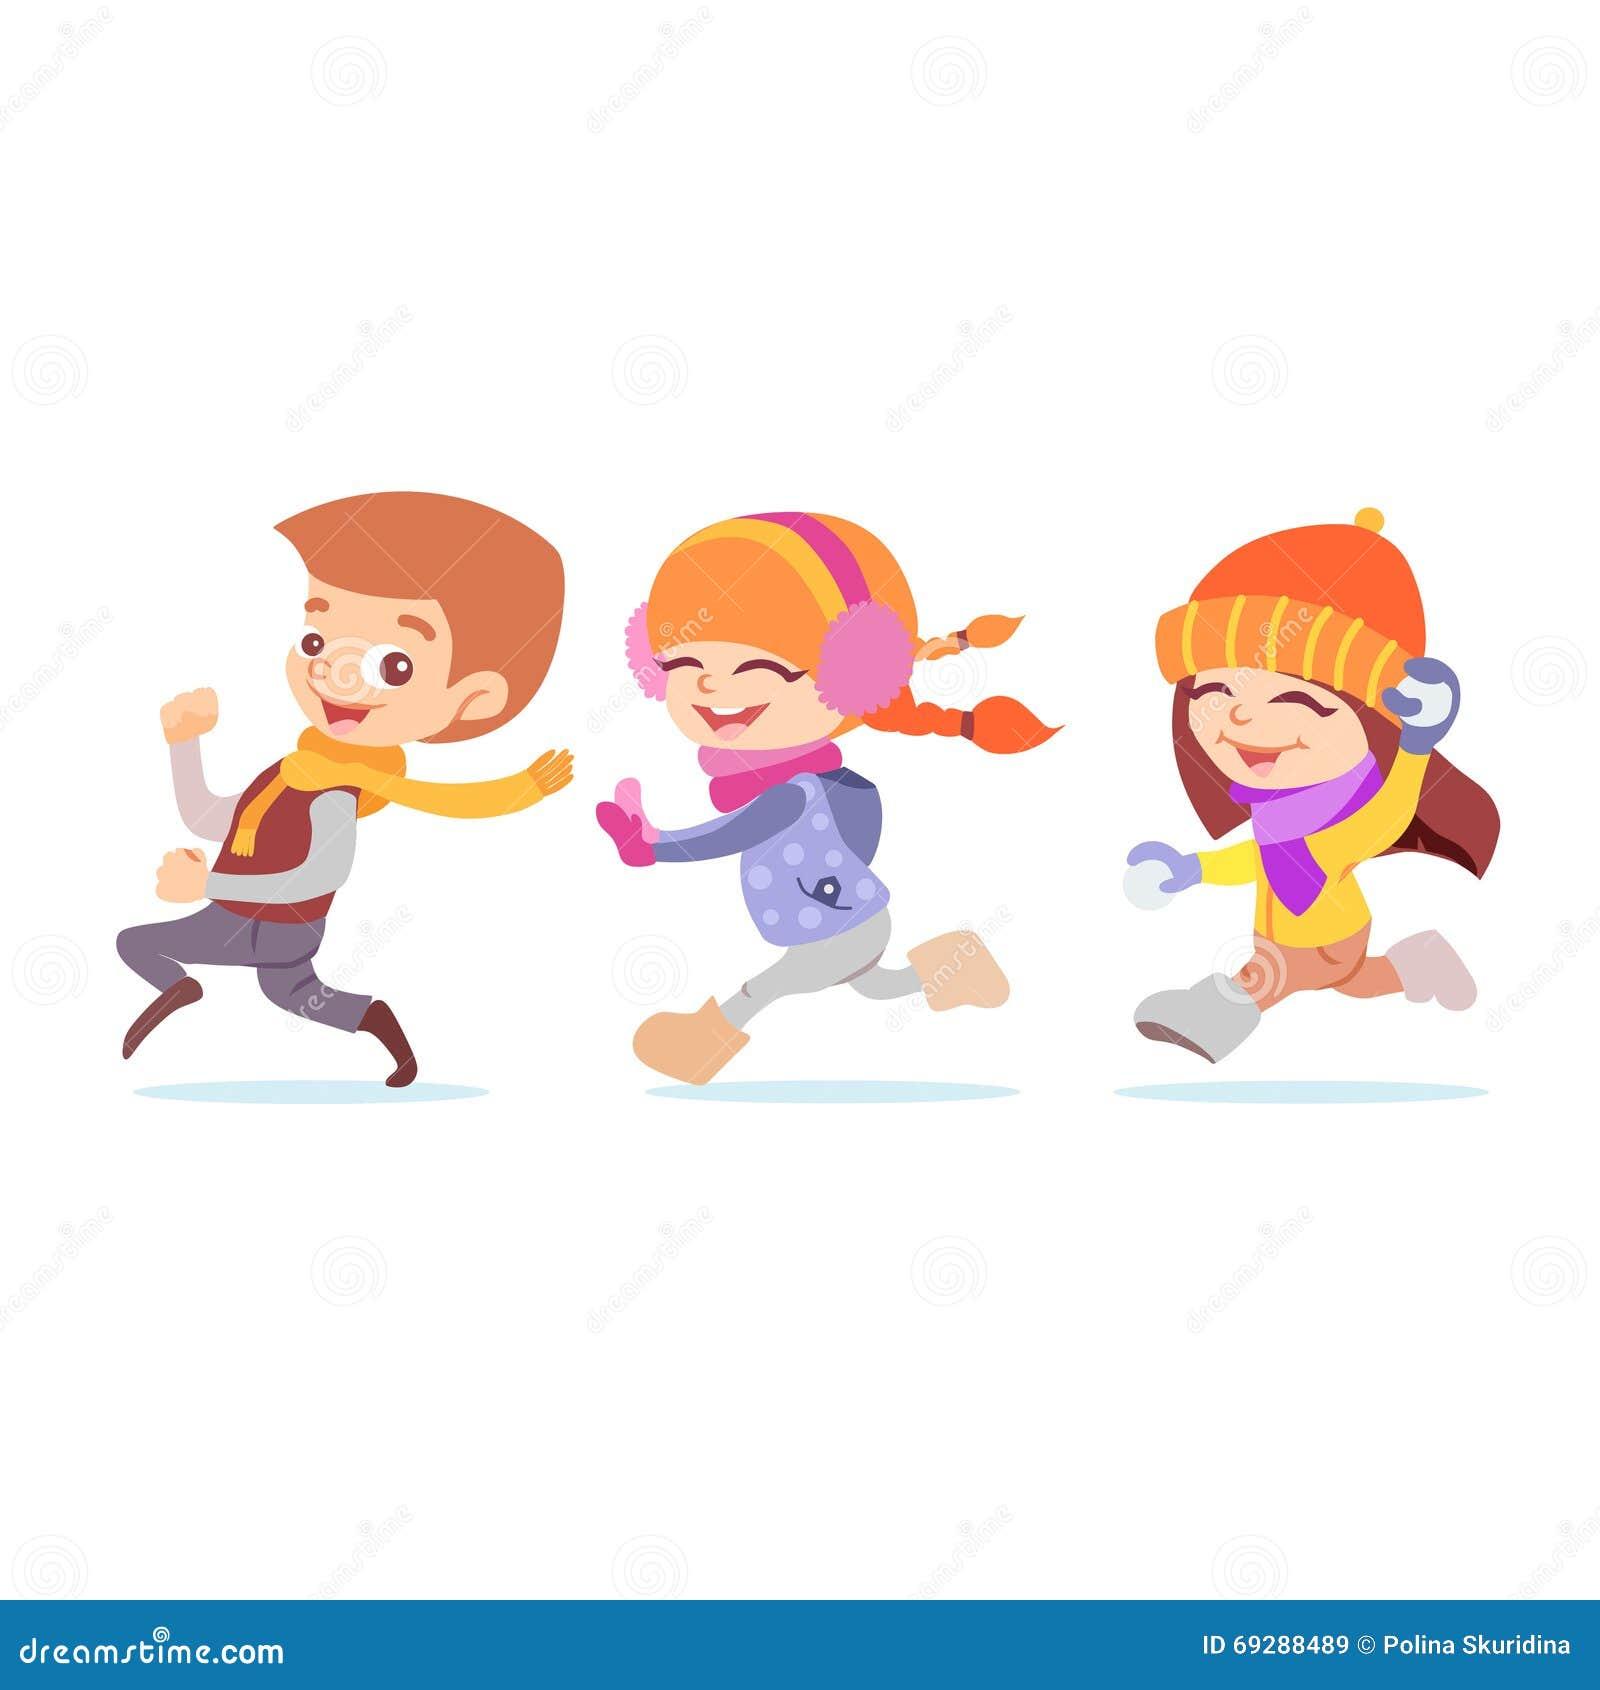 Uncategorized Kids Cartoon Download cute cartoon playing kids running in winter stock vector image royalty free download kids